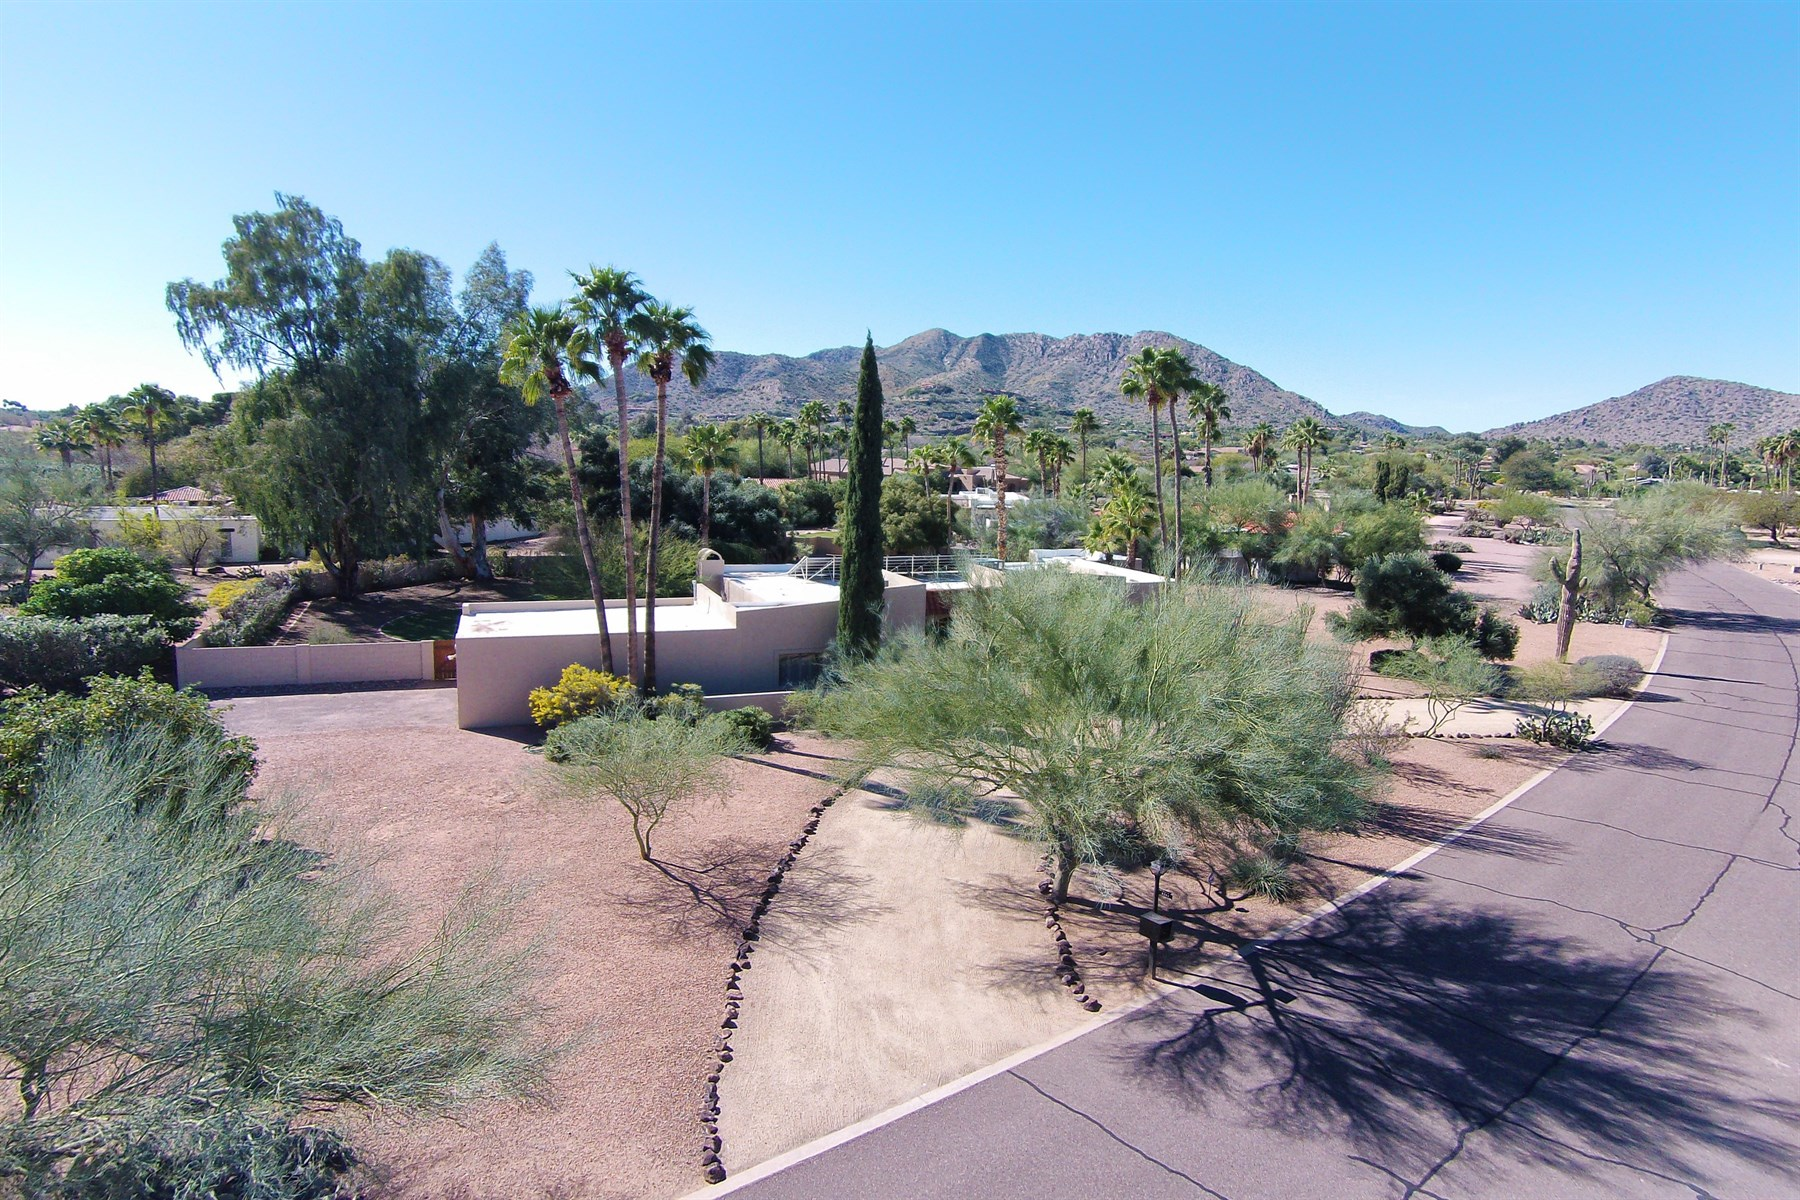 Terreno por un Venta en One Acre View Property in Paradise Valley 5249 E Orchid Lane #9 Paradise Valley, Arizona 85253 Estados Unidos